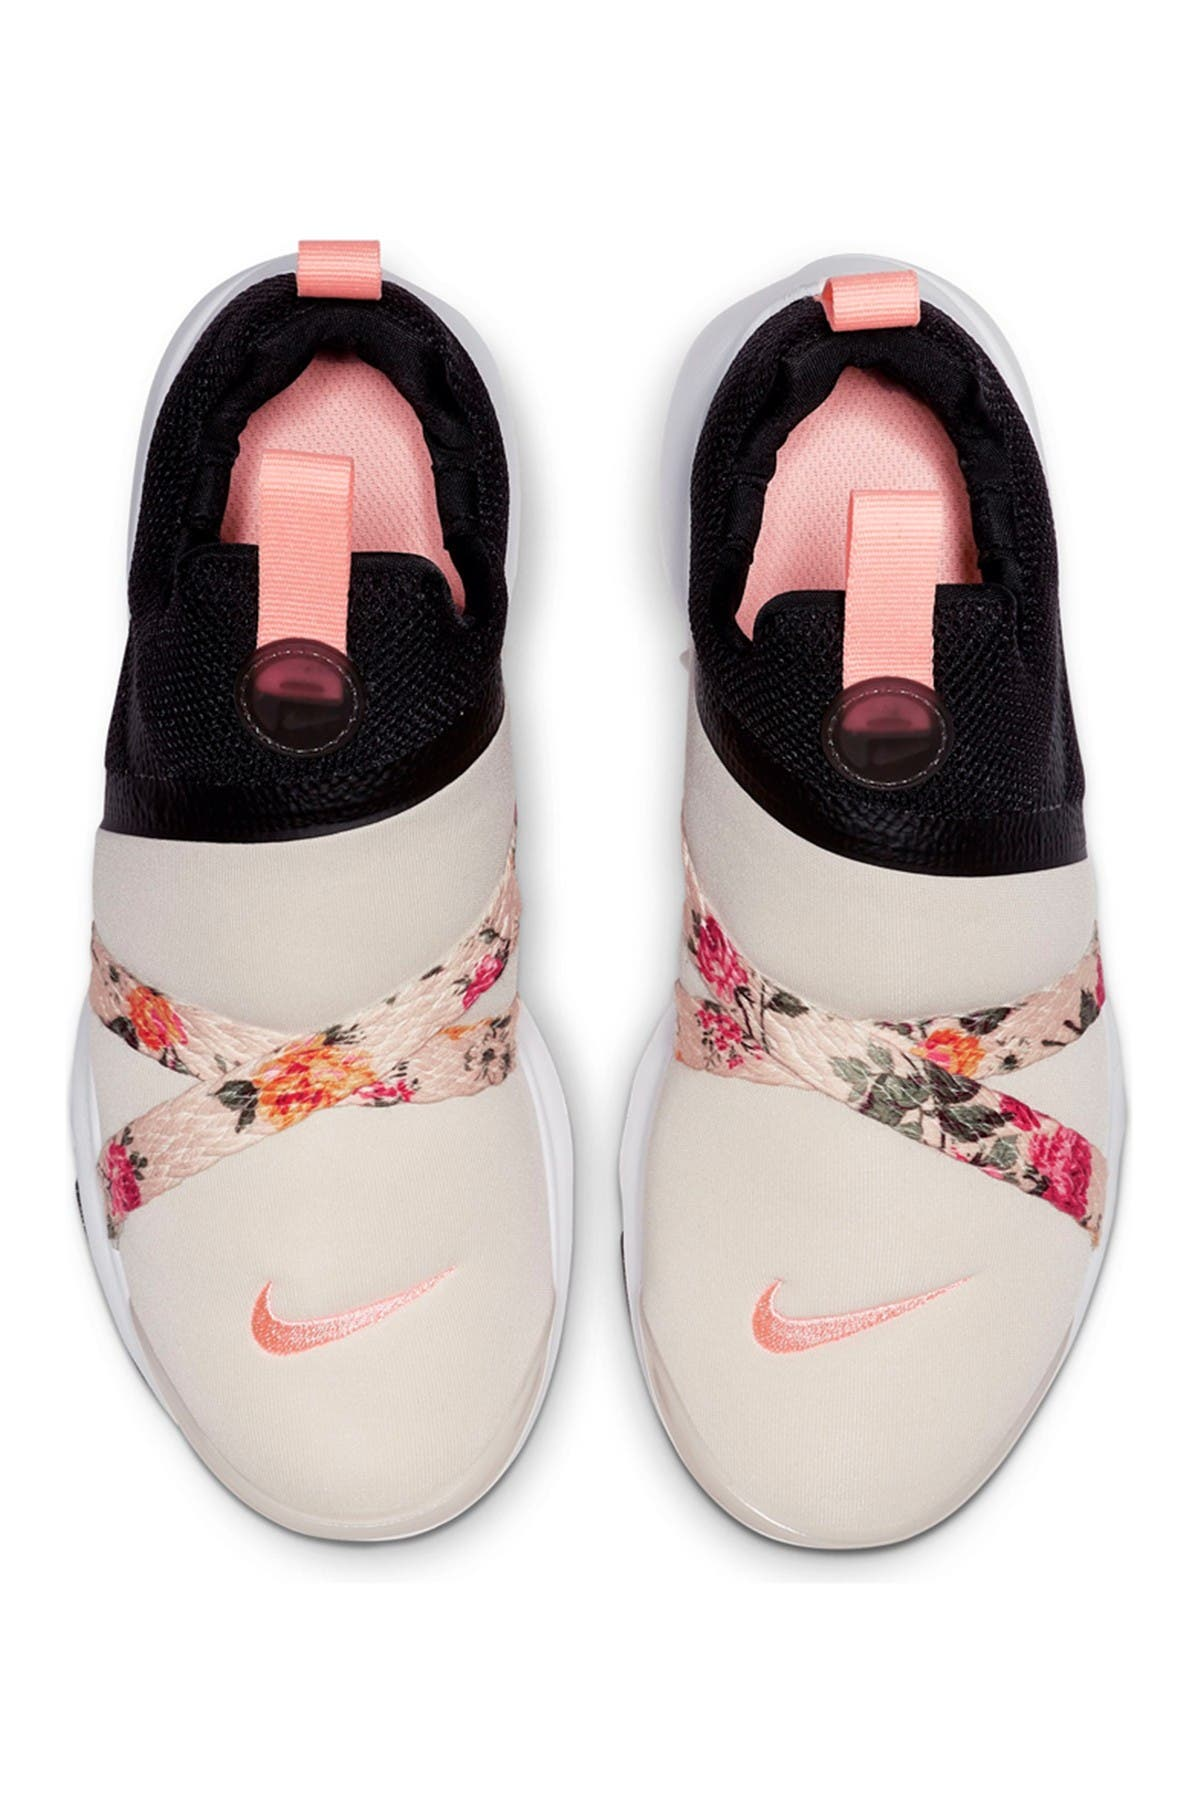 Nike   Presto Extreme Vintage Floral